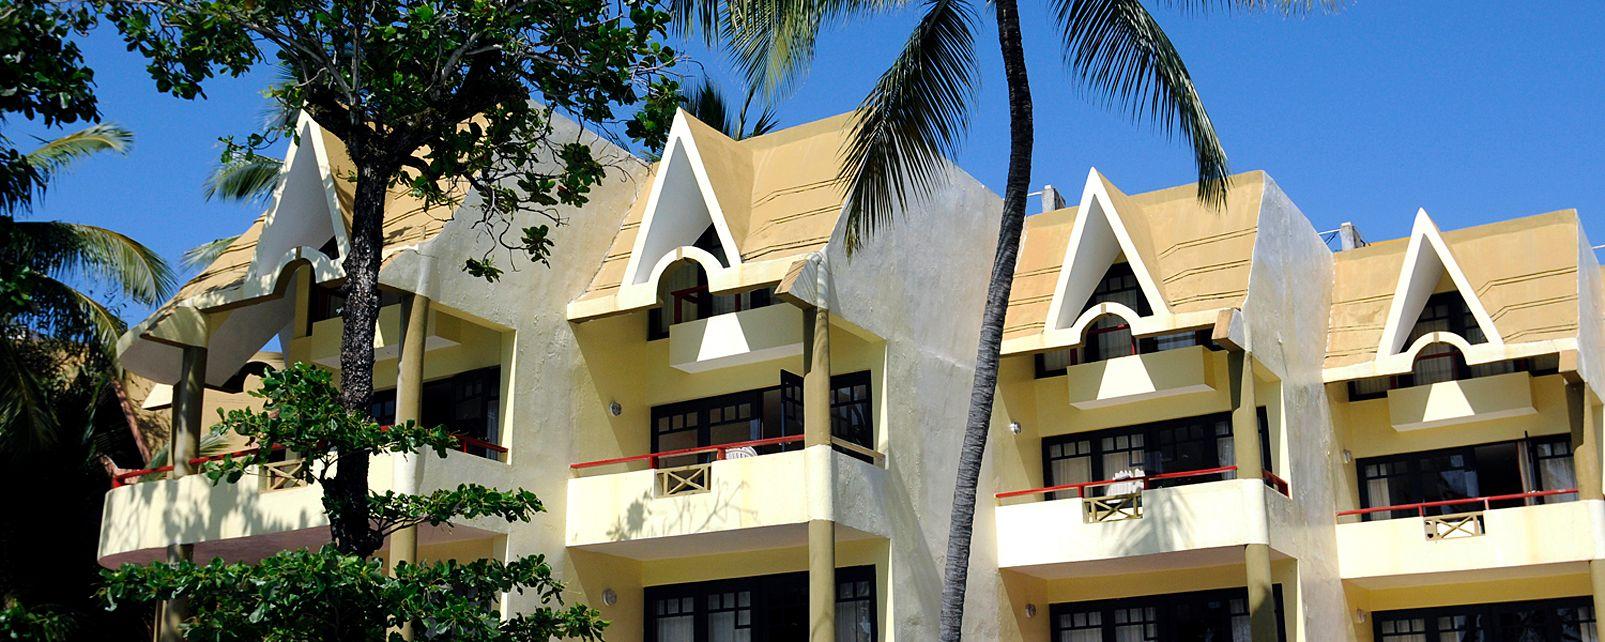 Hôtel Casa Marina Beach